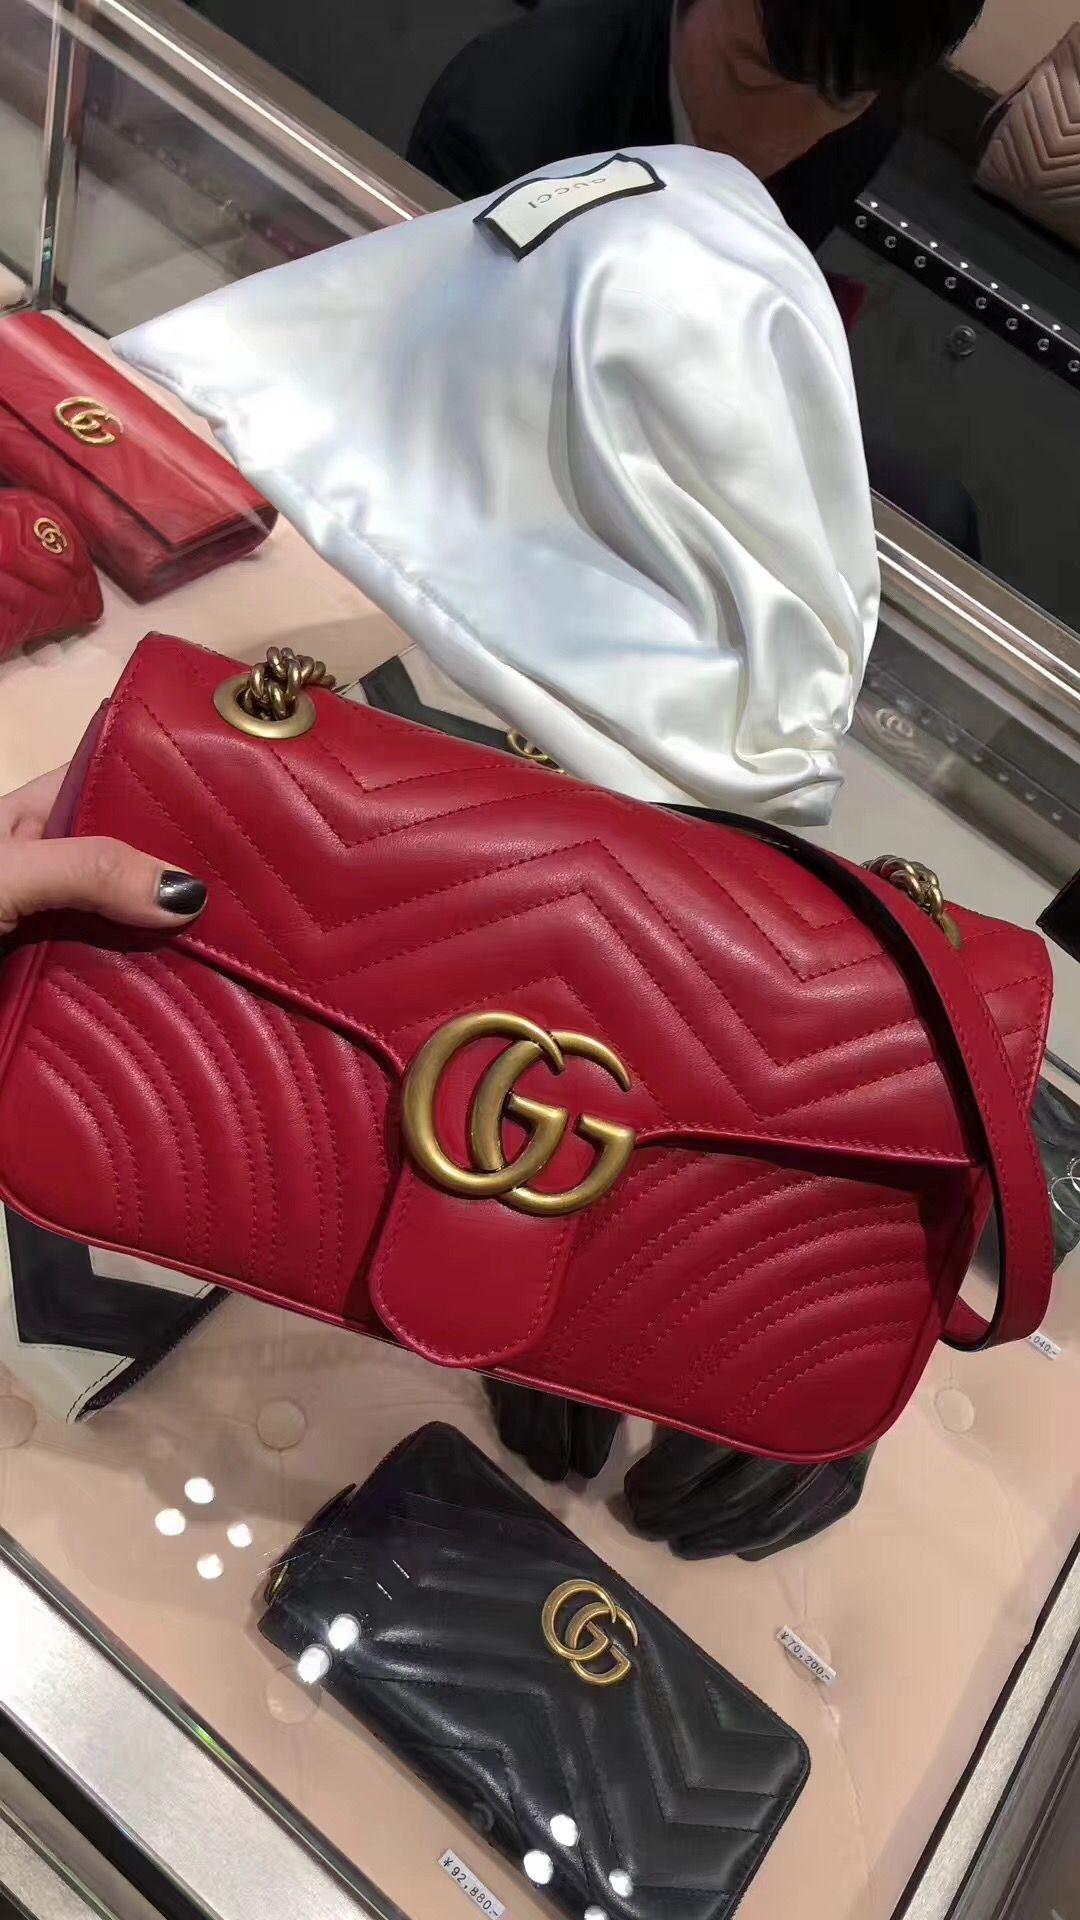 2b9f124862a9 Gucci Chain Shoulder Bag 443497 Red - $425.00 | discount price gucci ...